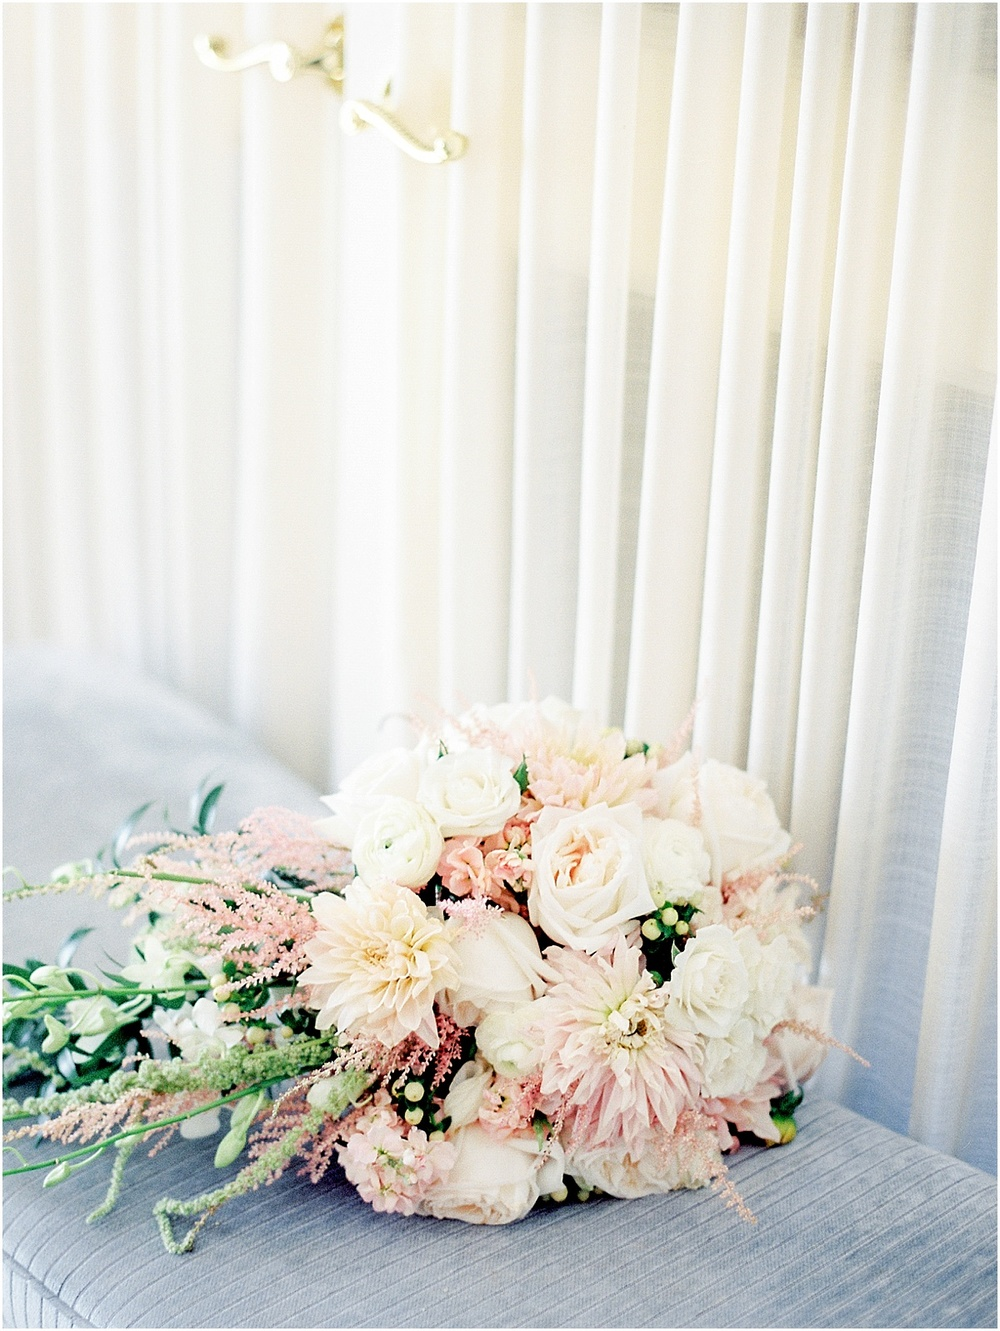 St_Louis_Wedding_Fine_Art_Film_Photographer_Jordan_Brittley_(www.jordanbrittley.com)_0046.jpg